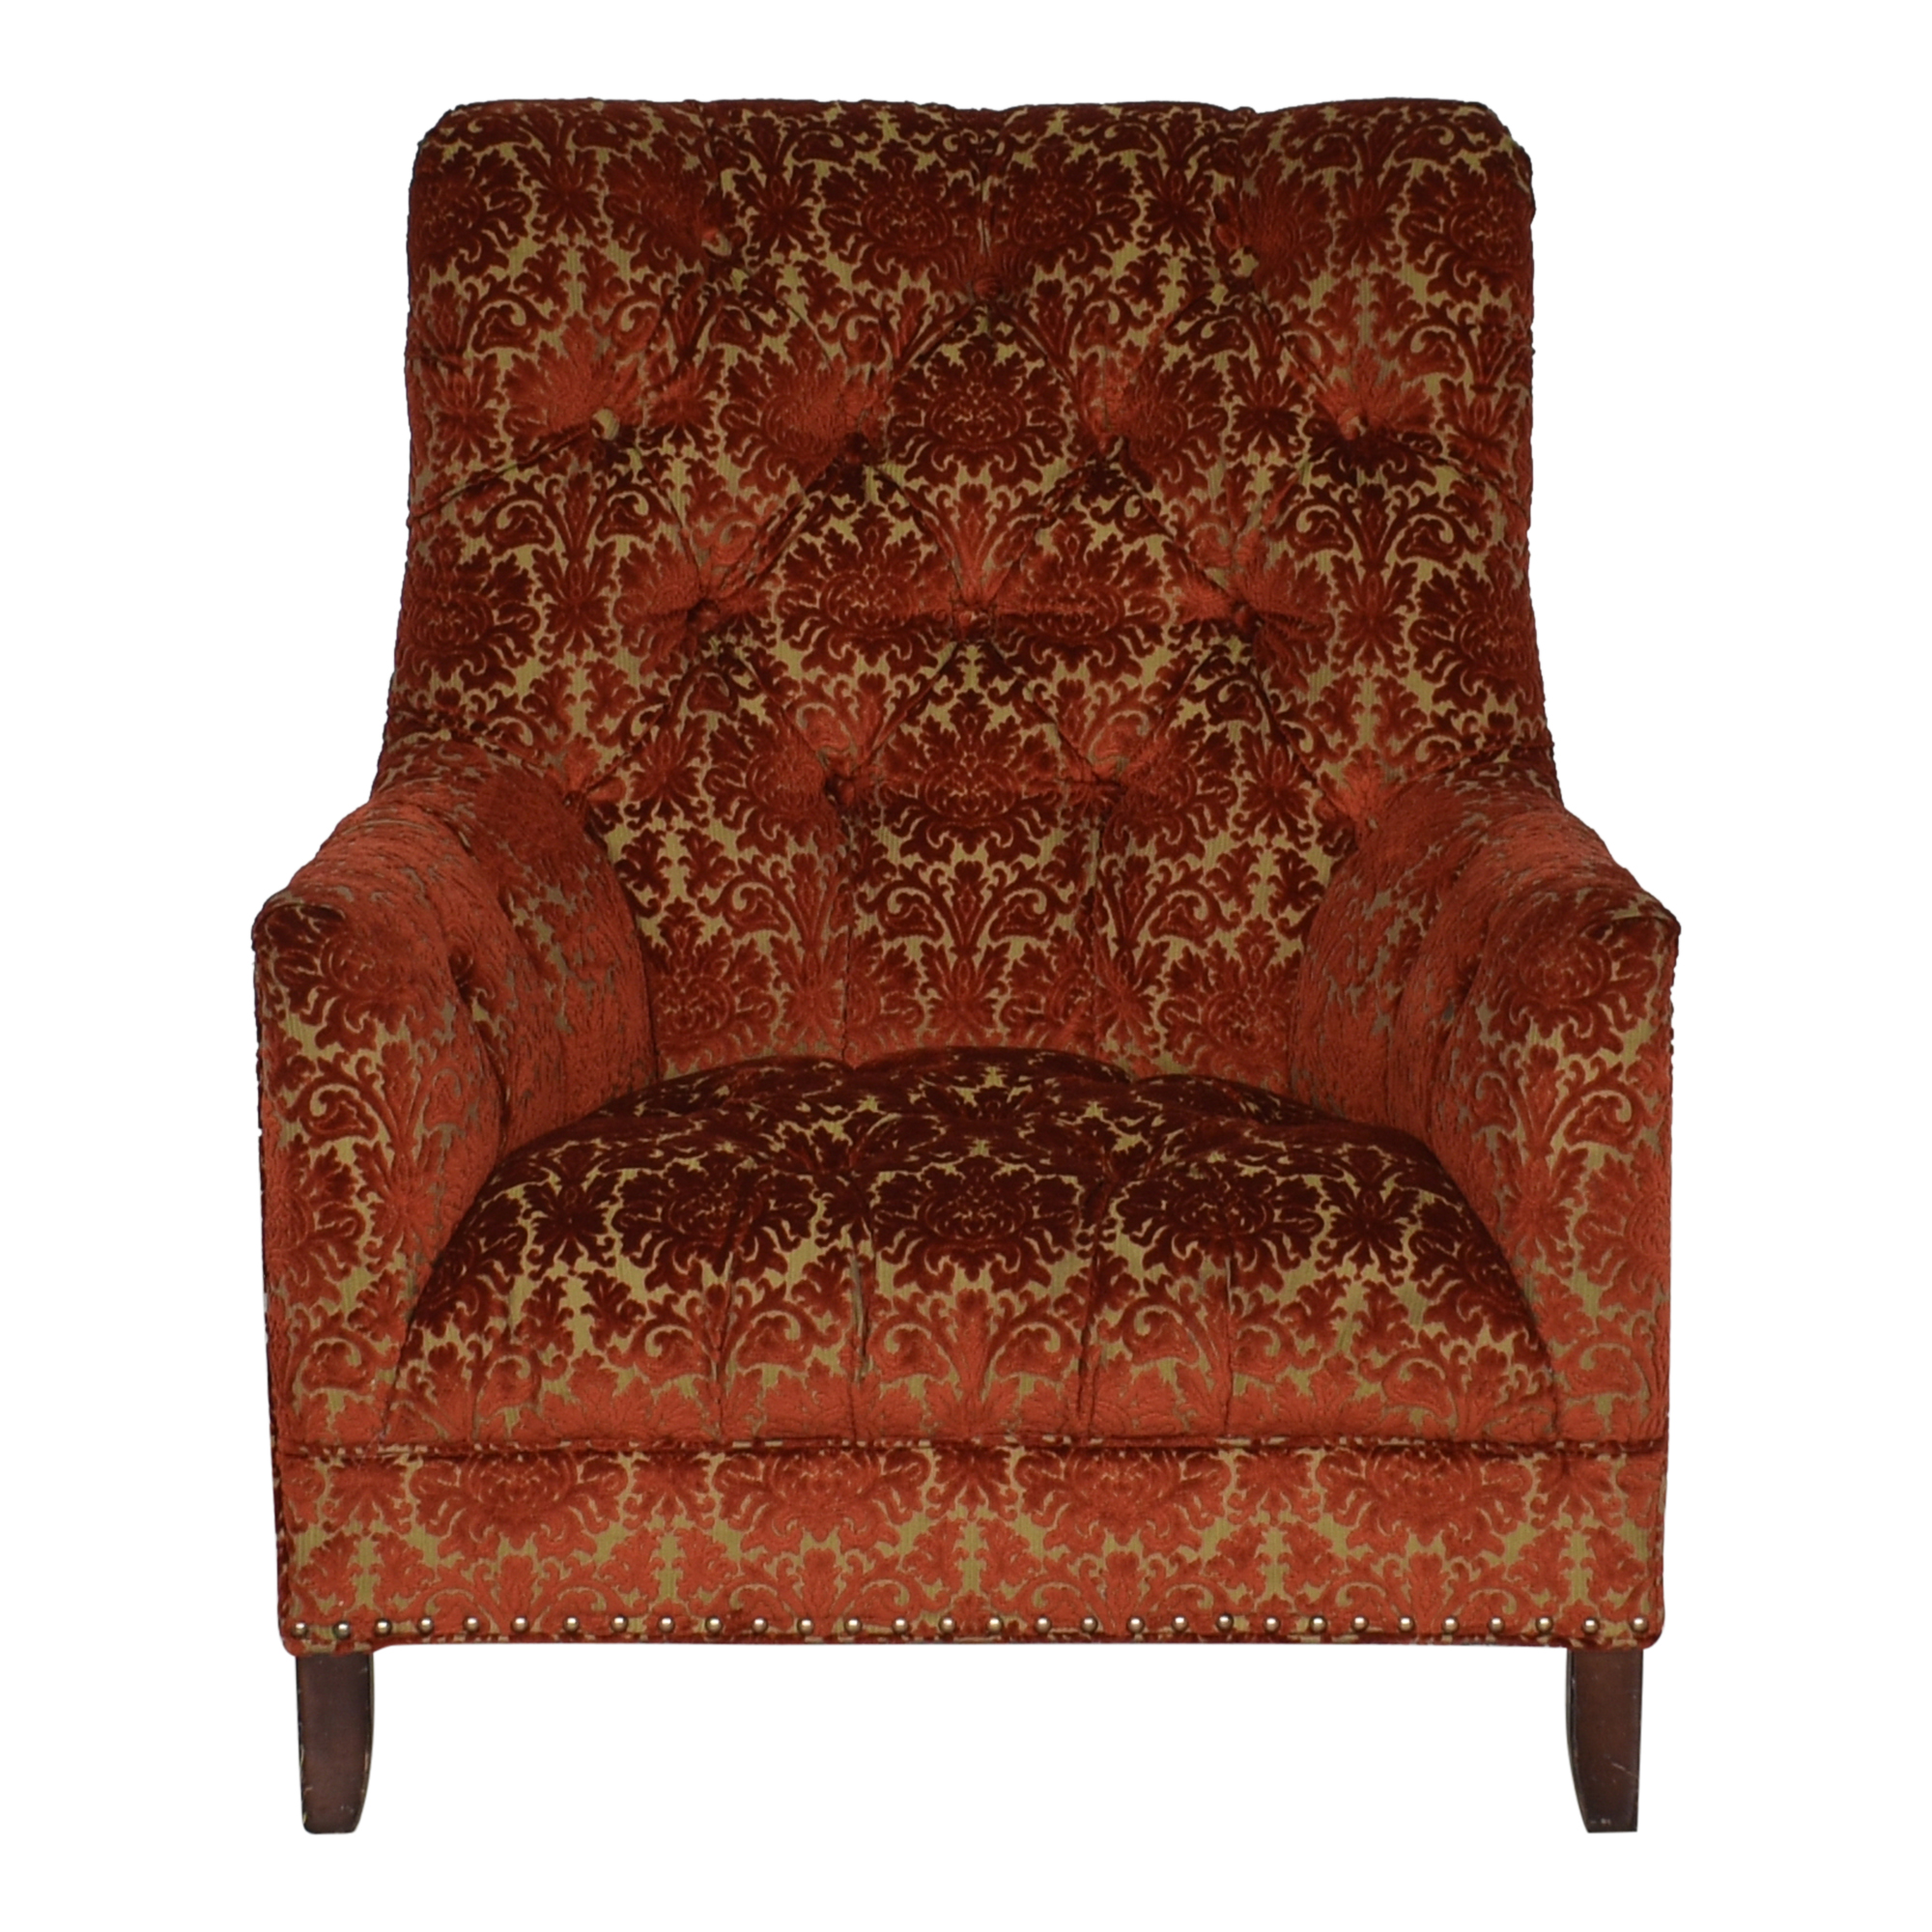 Arhaus Club Accent Chair with Nailheads / Chairs